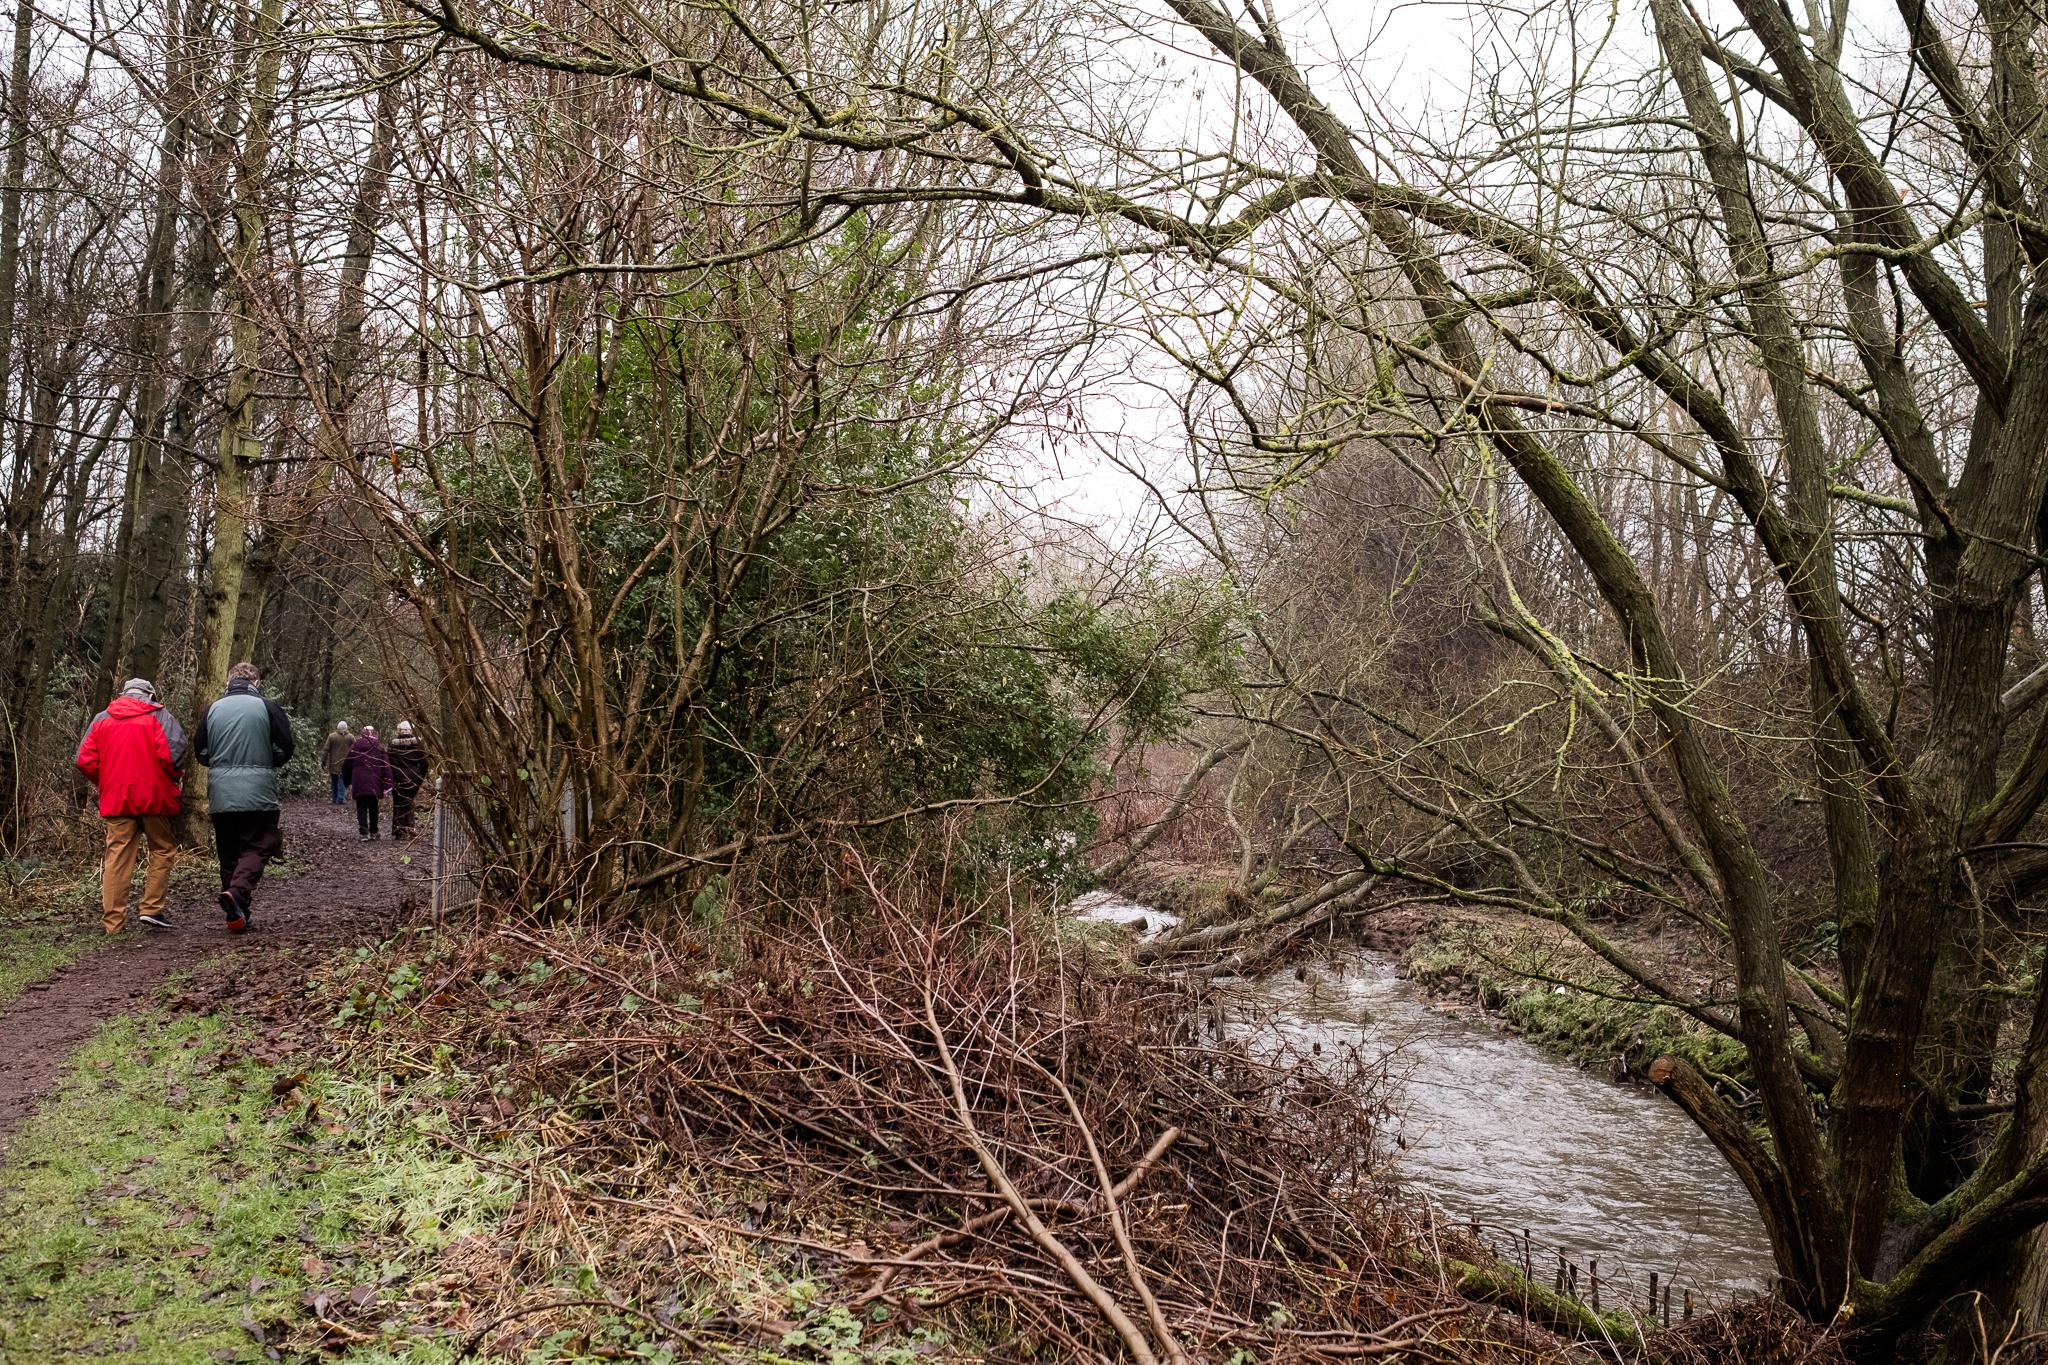 Closer to Home Walk Photowalk Joiner's Square, Hanley, Stoke-on-Trent, Staffordshire Winter Nature Reserve-6.jpg